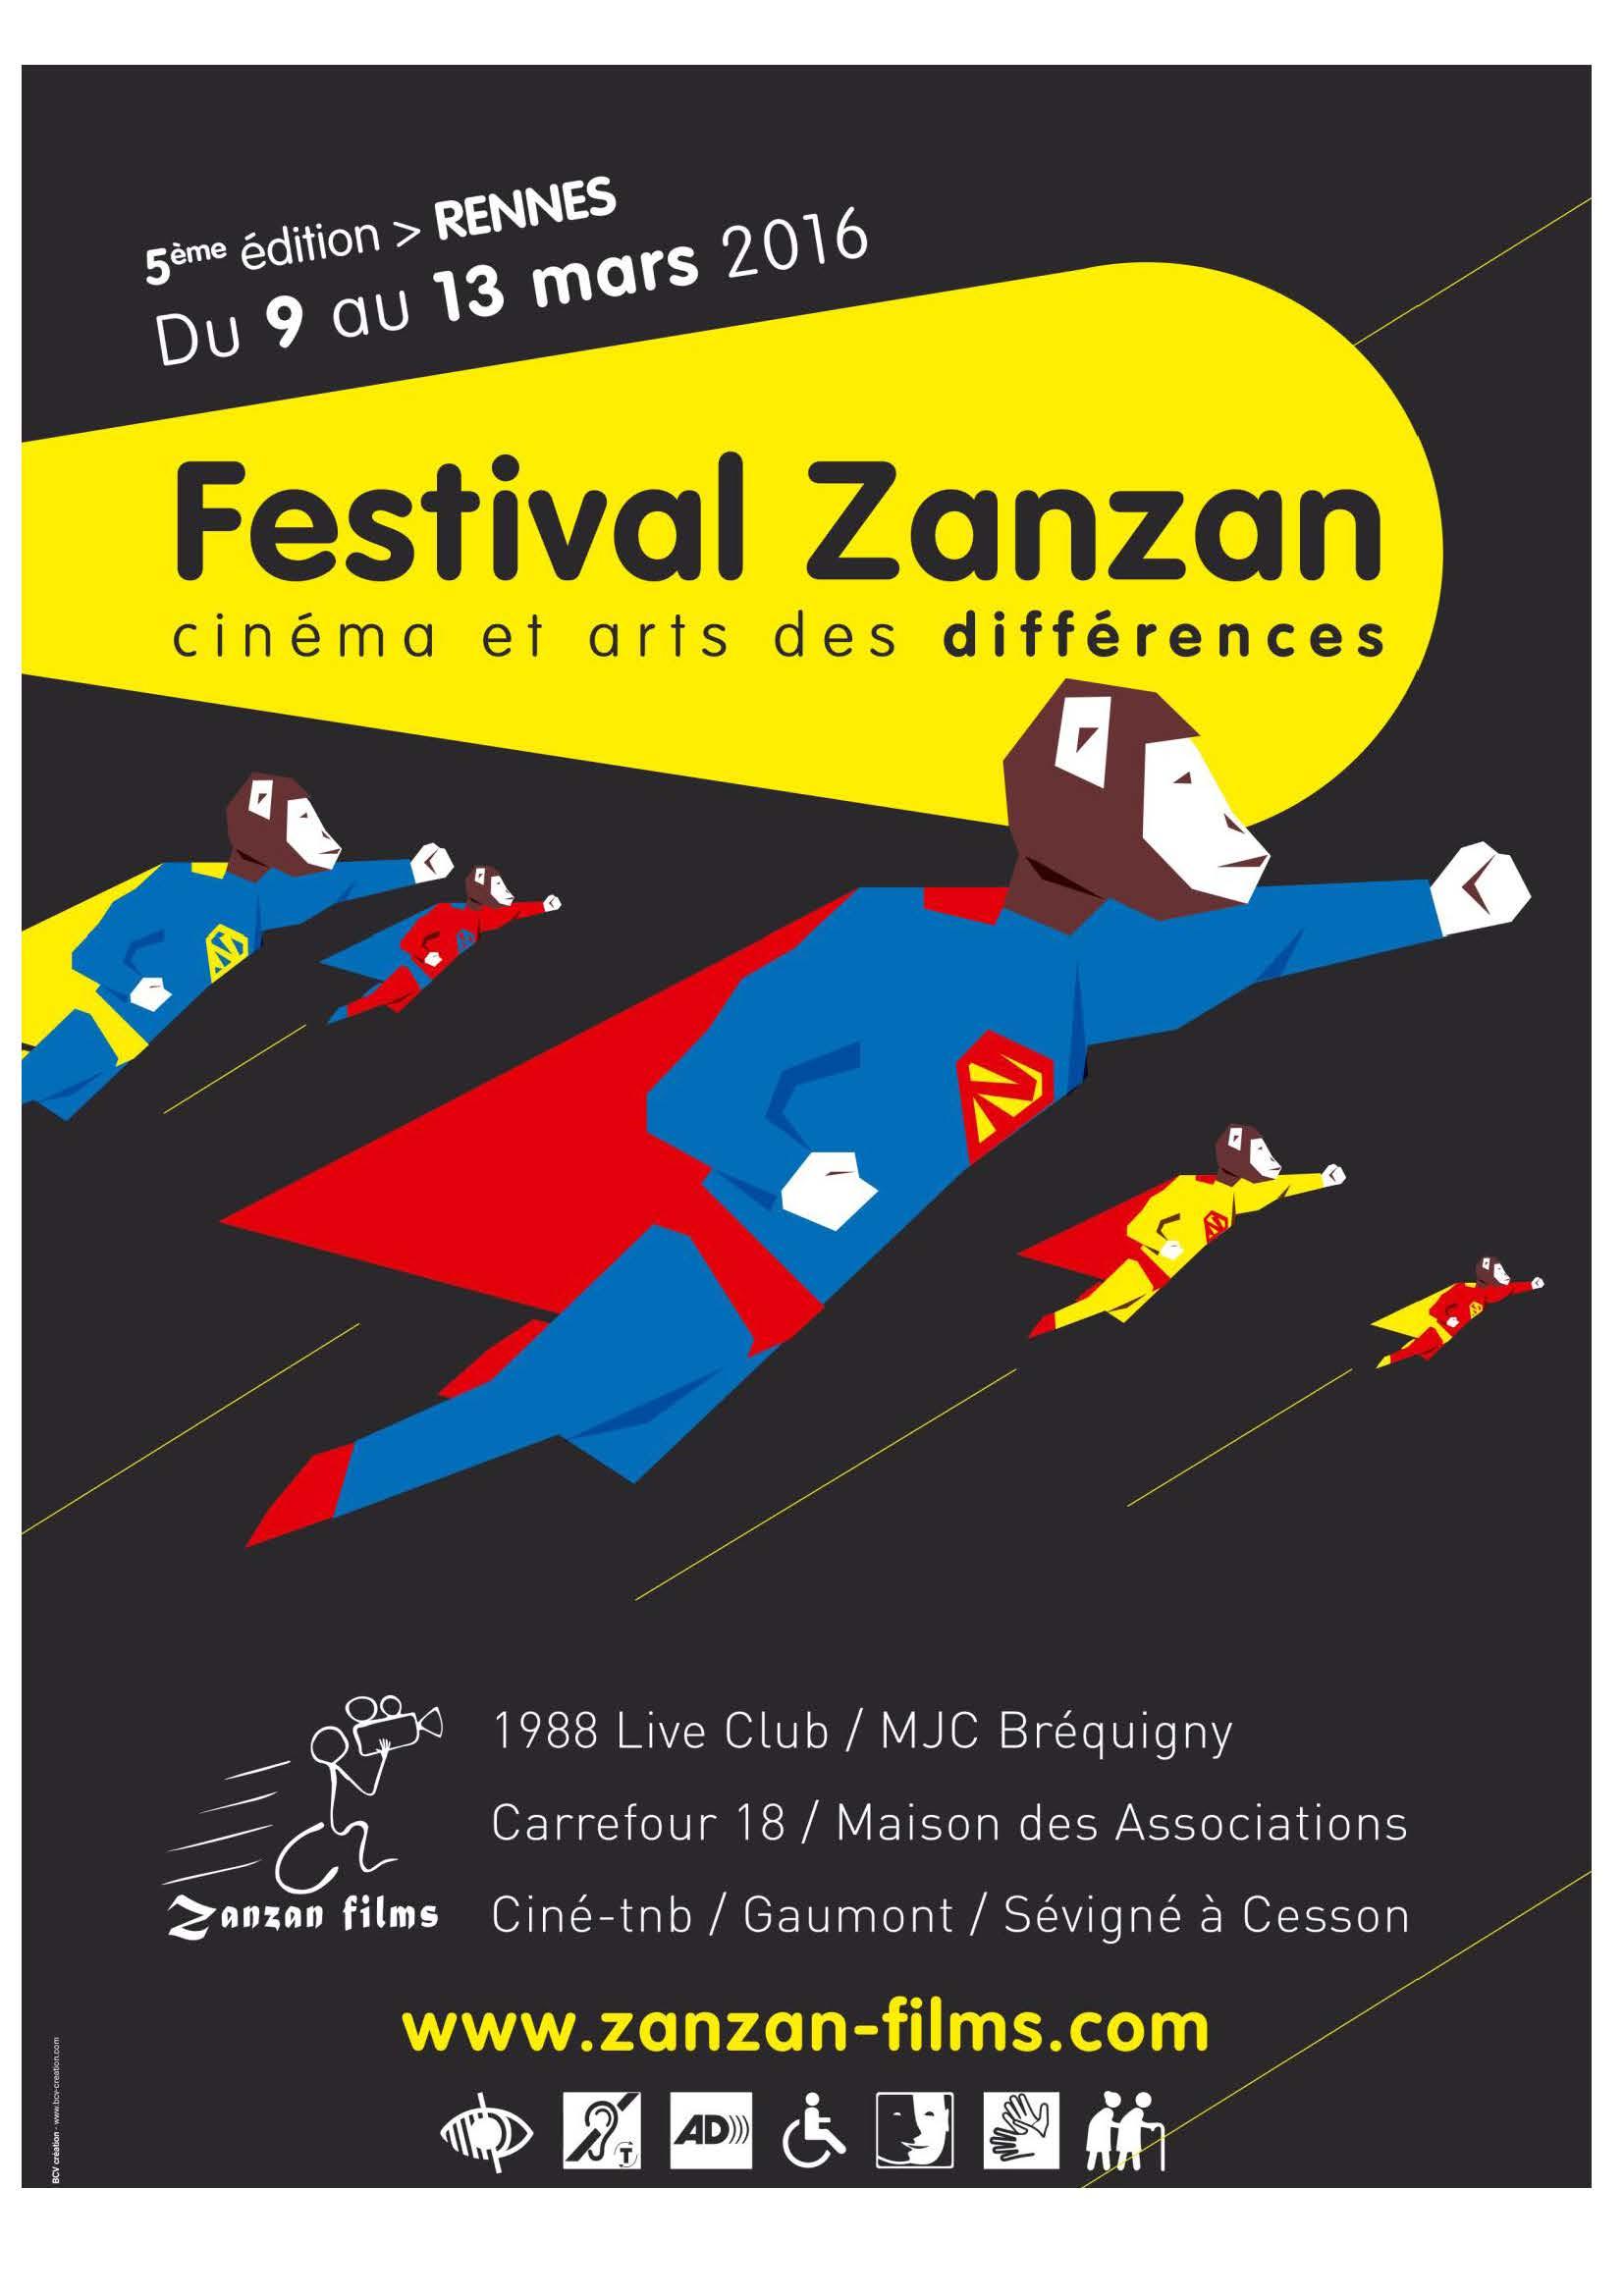 festival zanzan